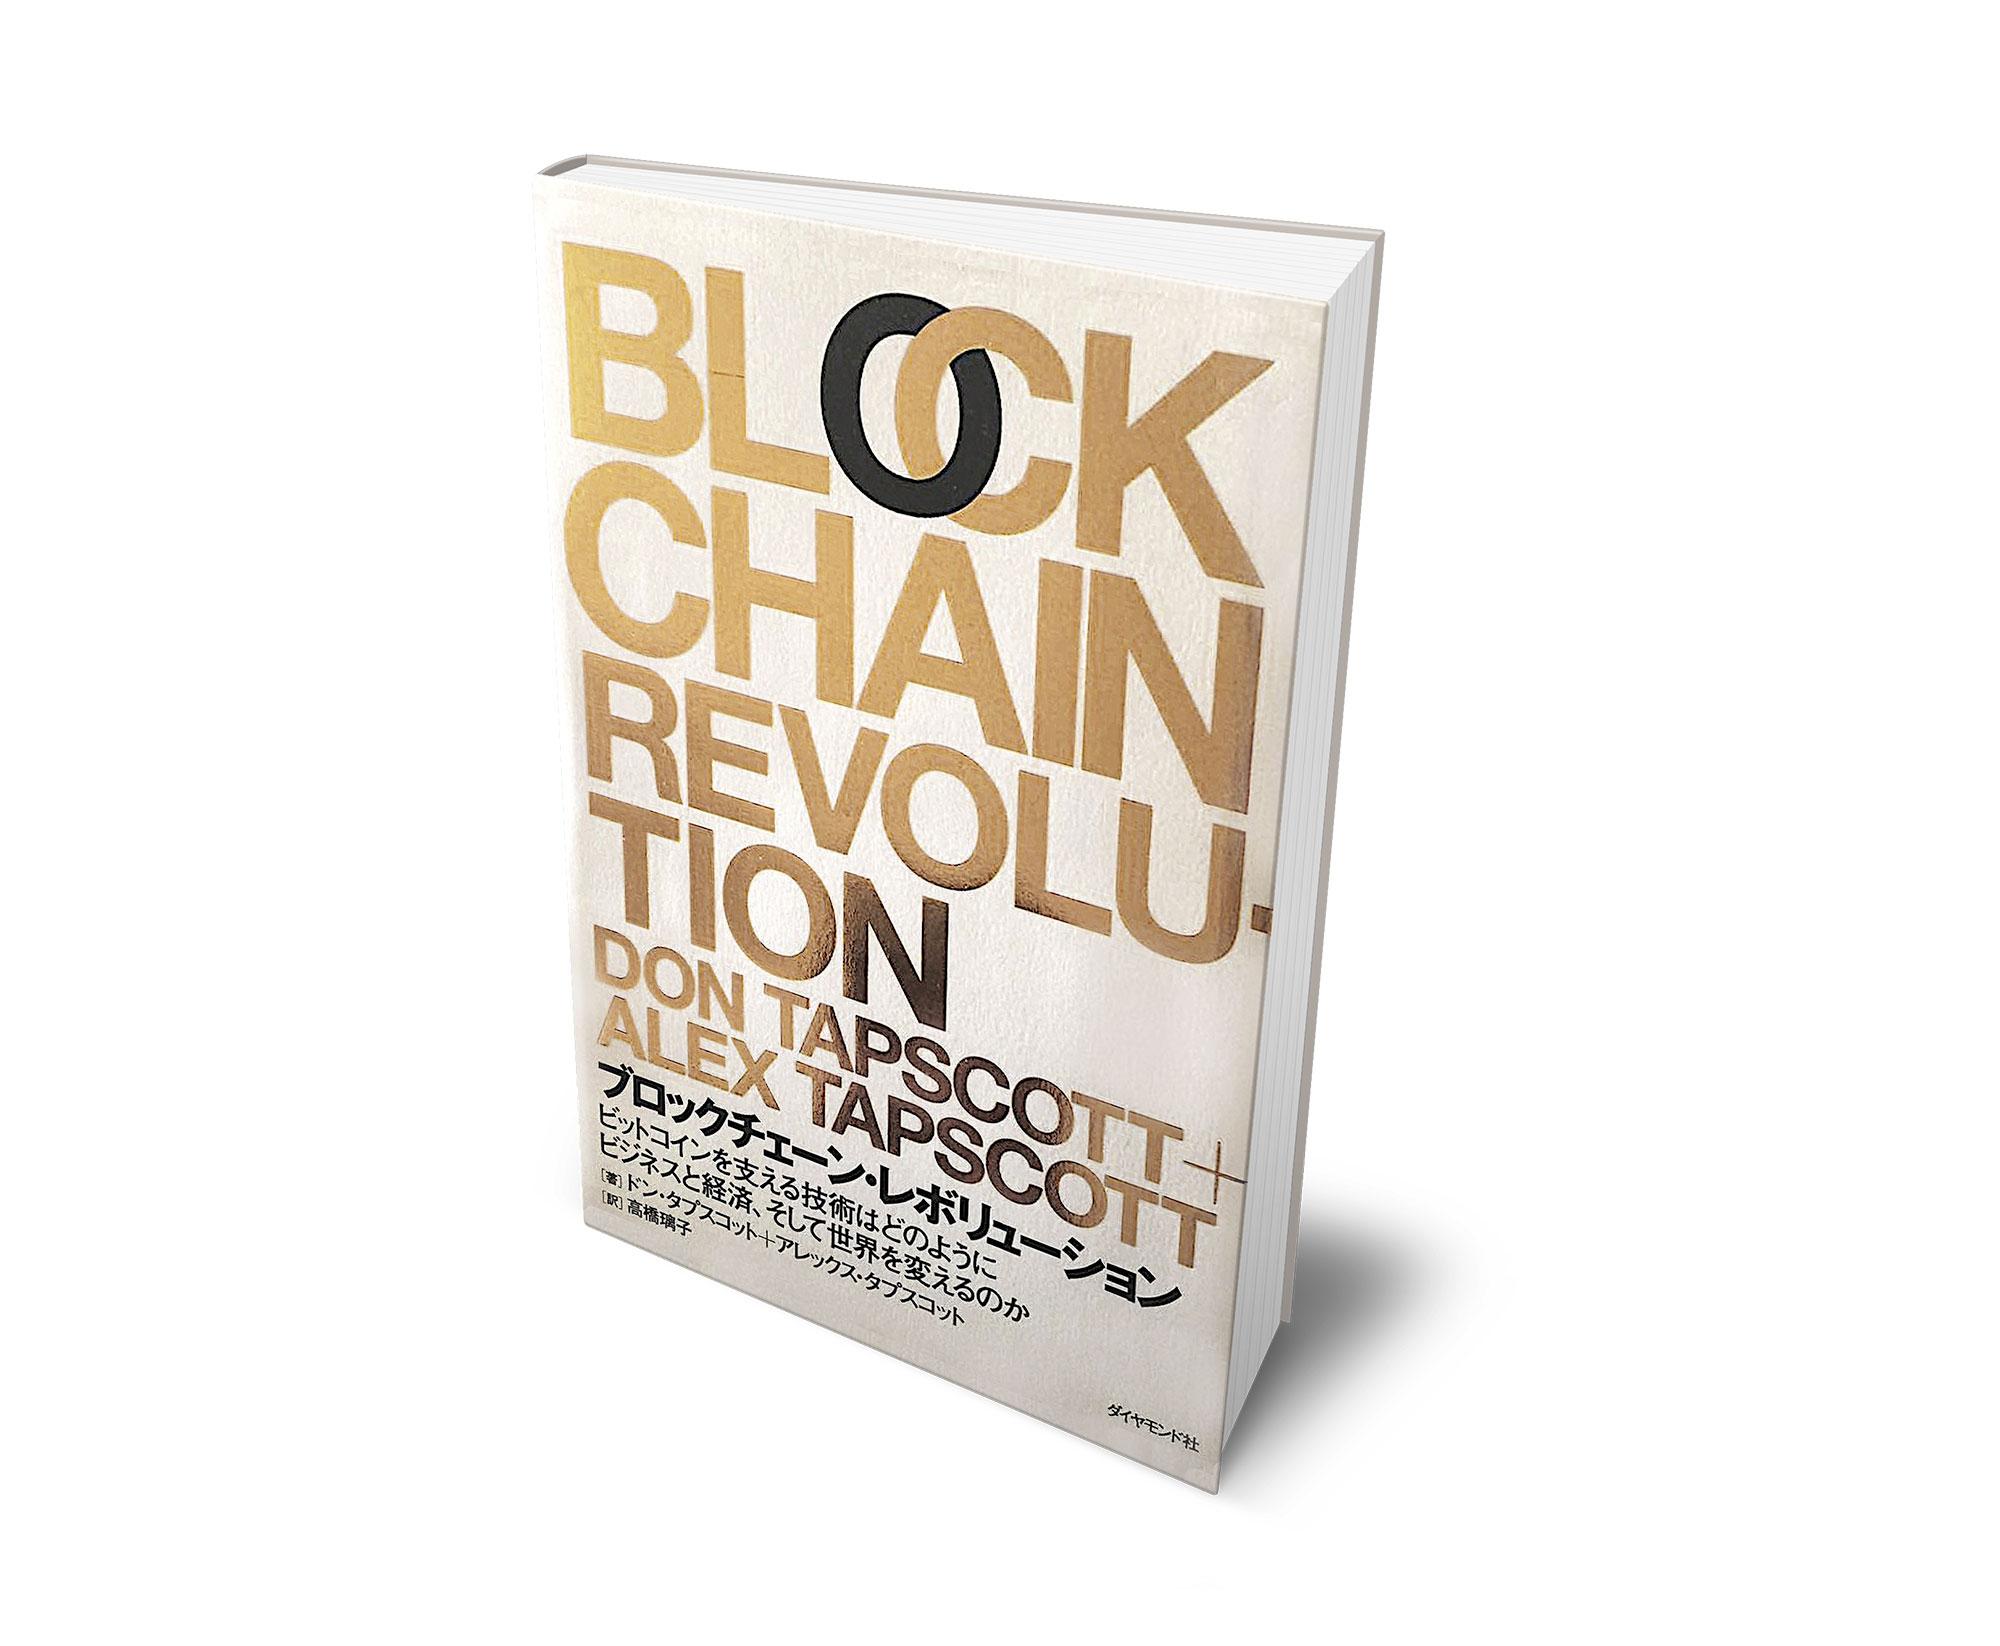 Blockchain Revolution - Japanese